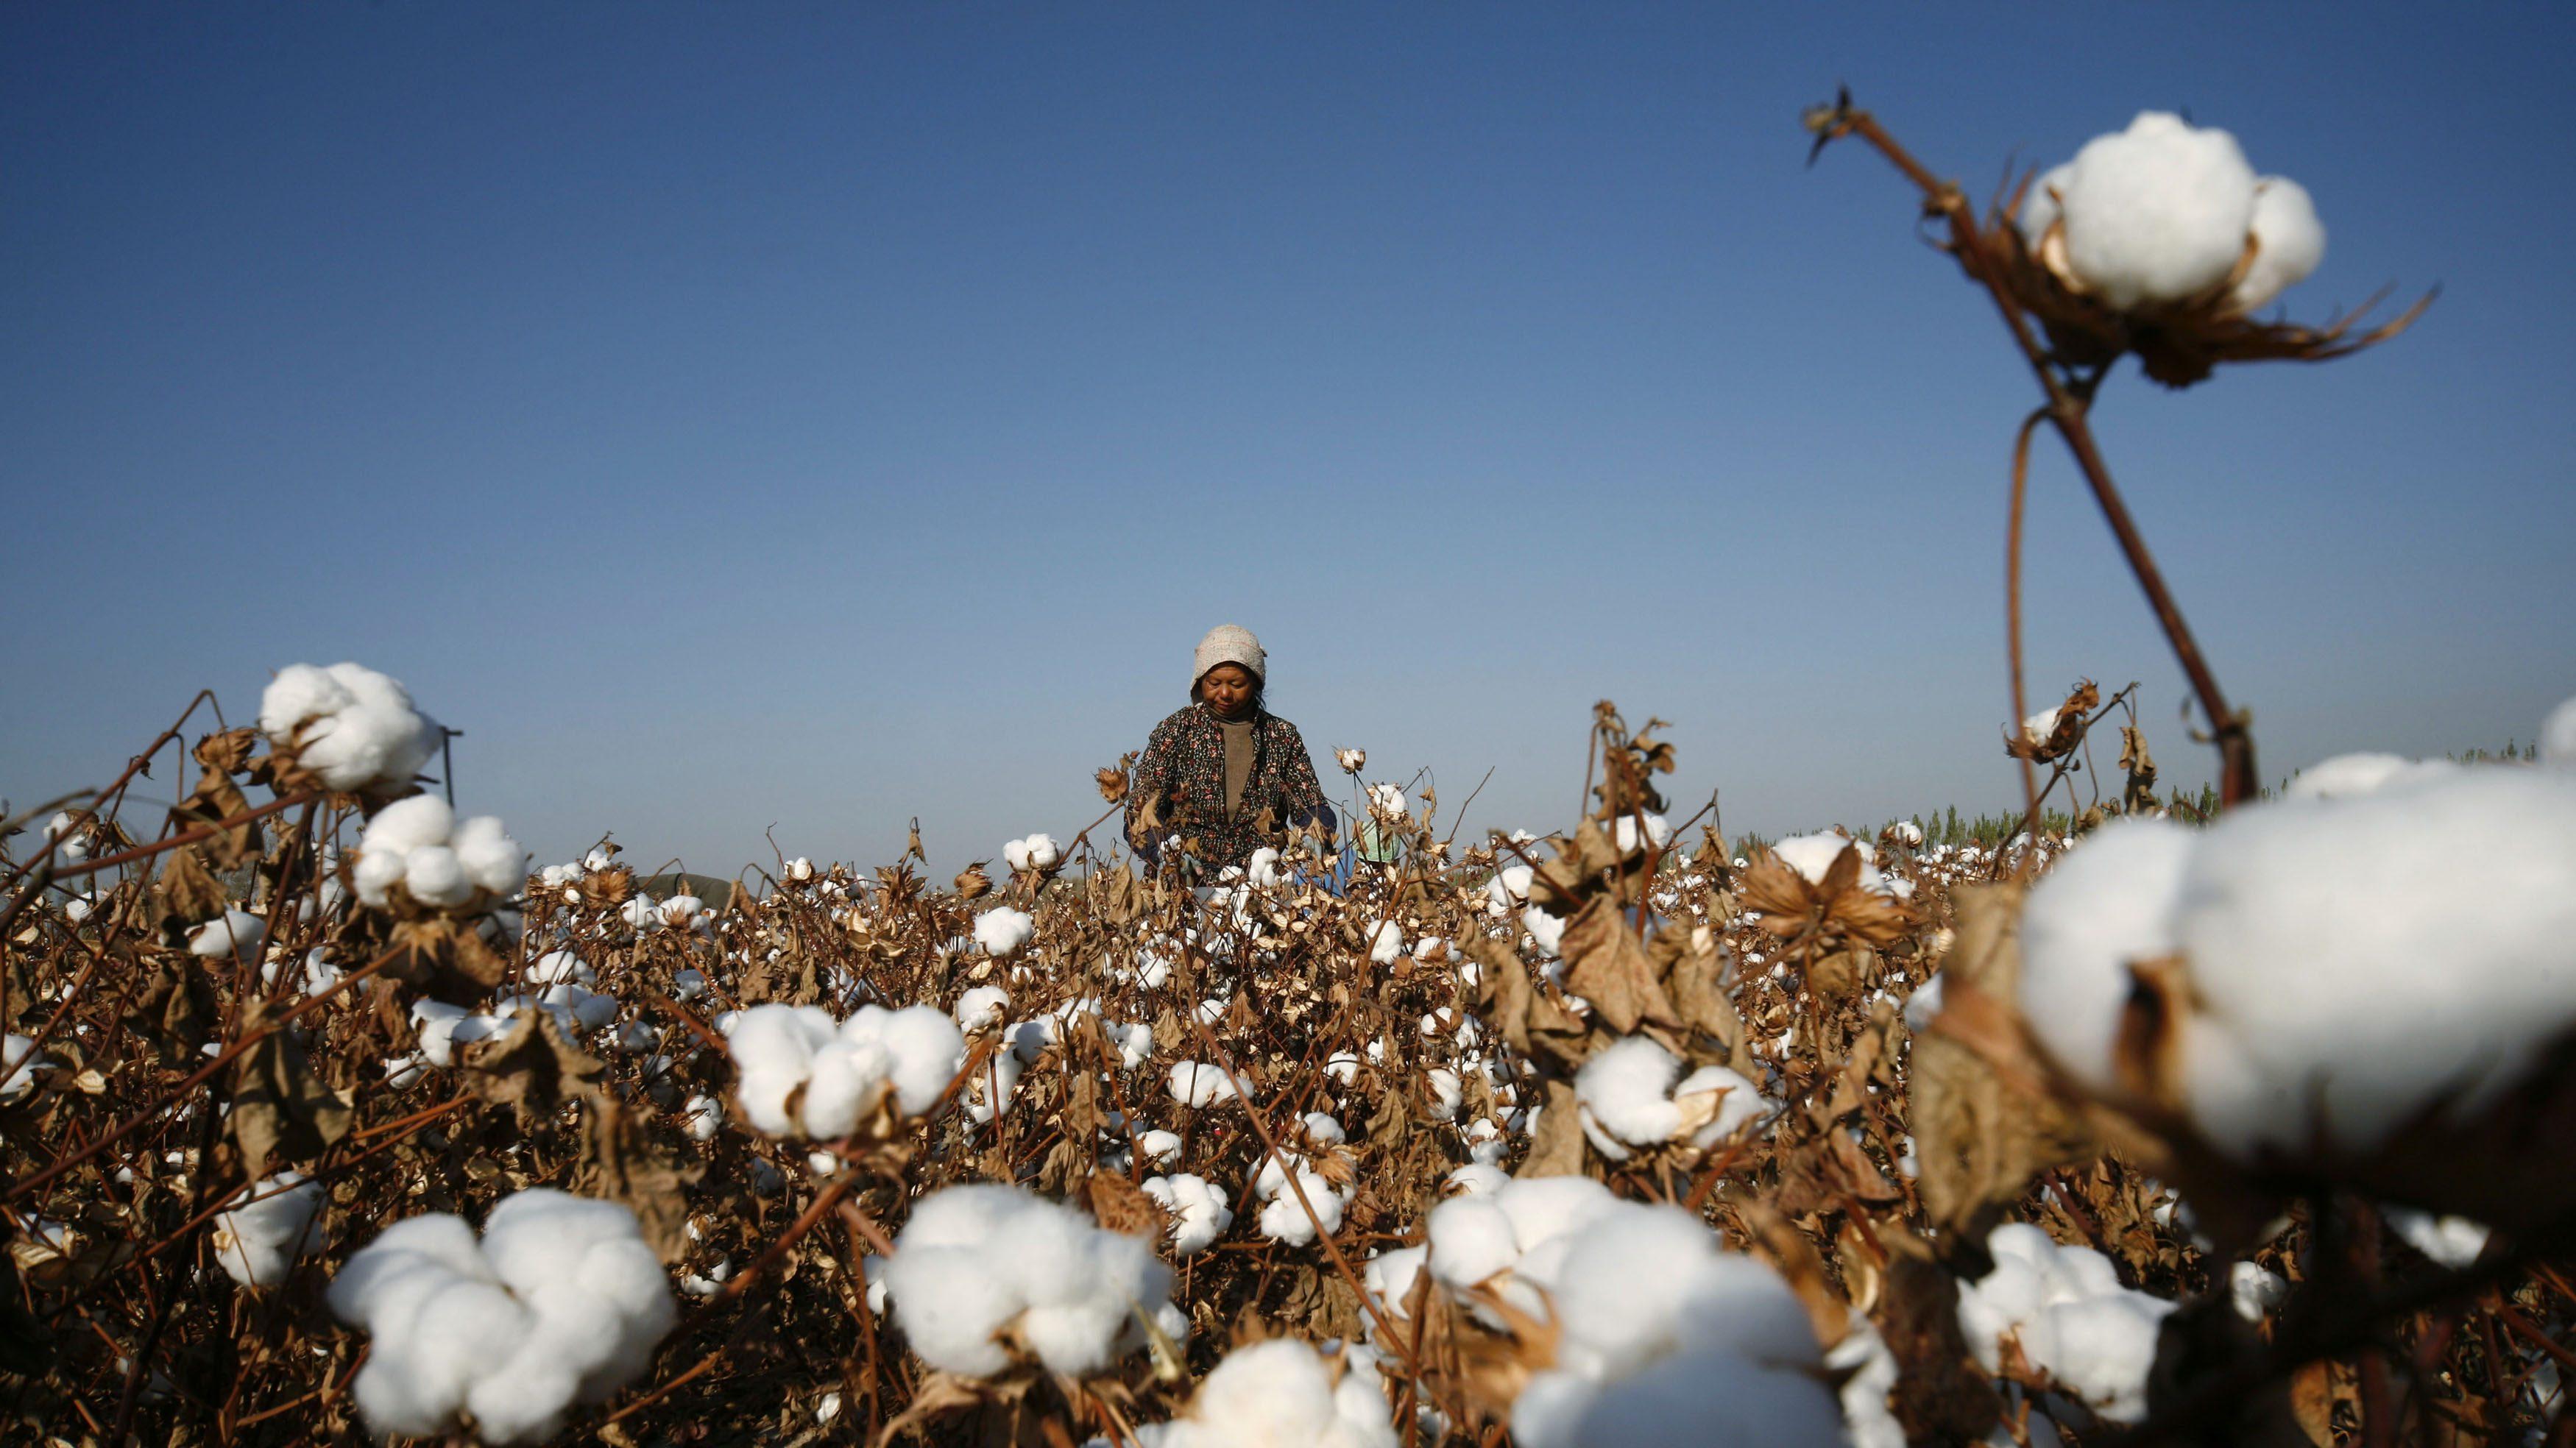 A farmer picks cotton on a farm on the outskirts of Hami, Xinjiang